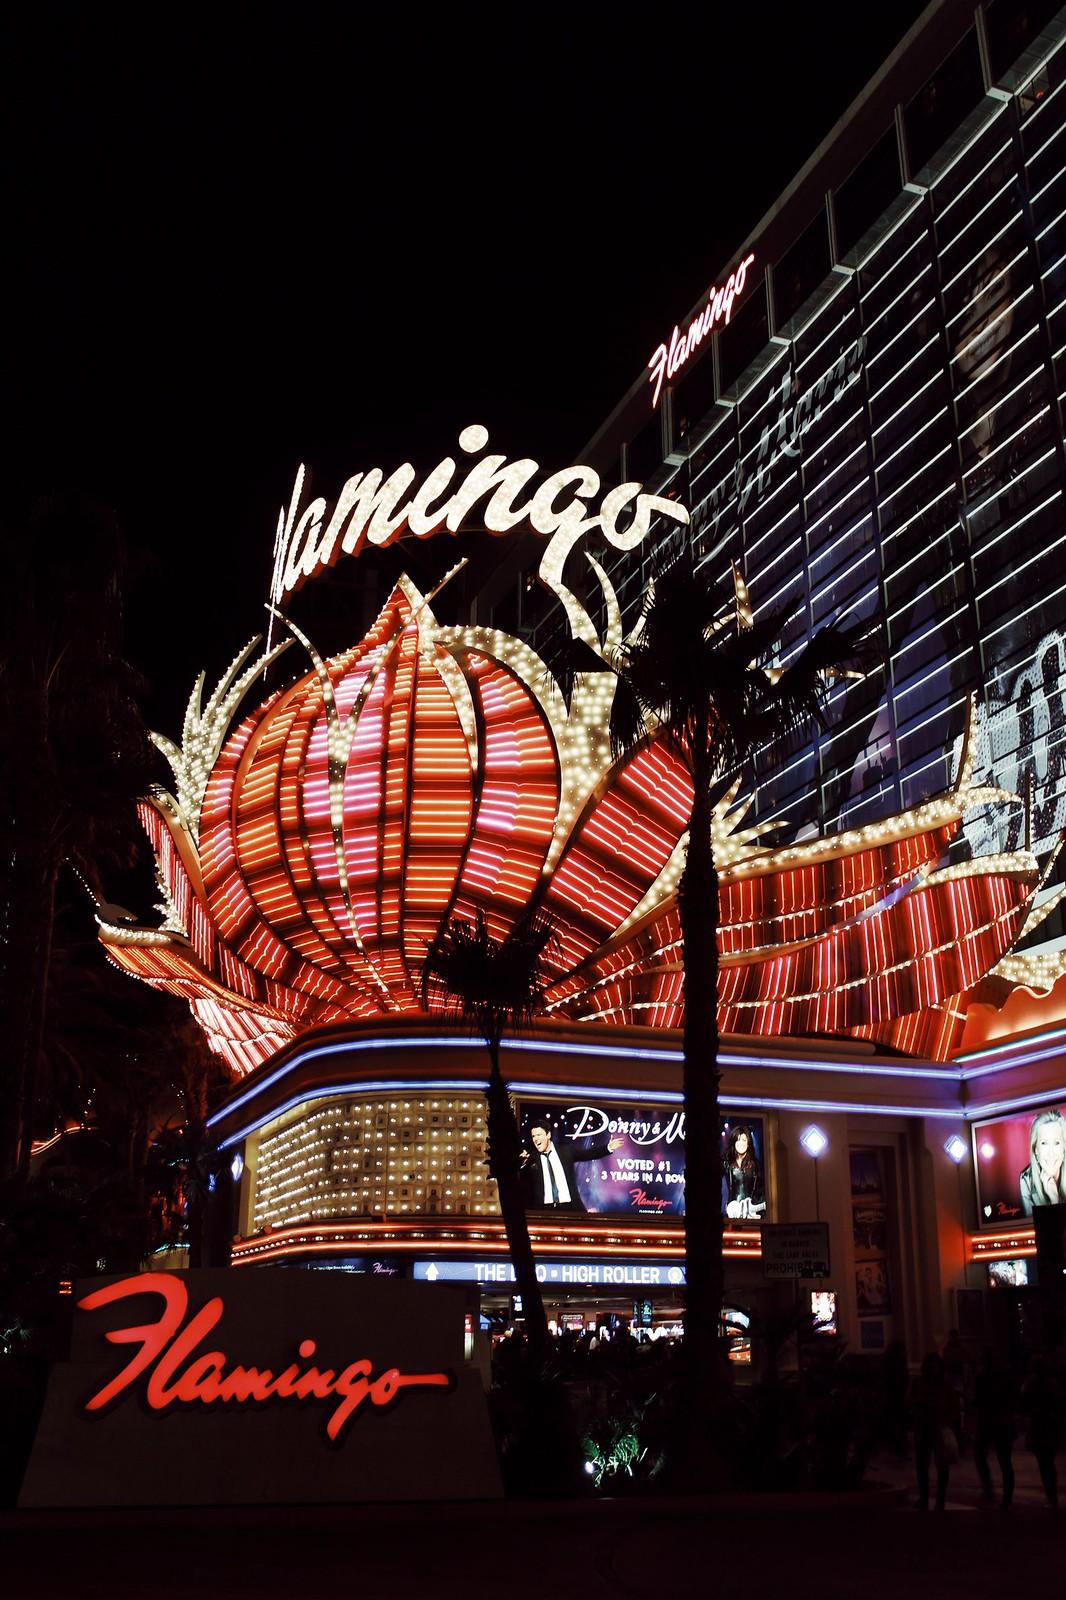 Las Vegas Flamingo Hotel